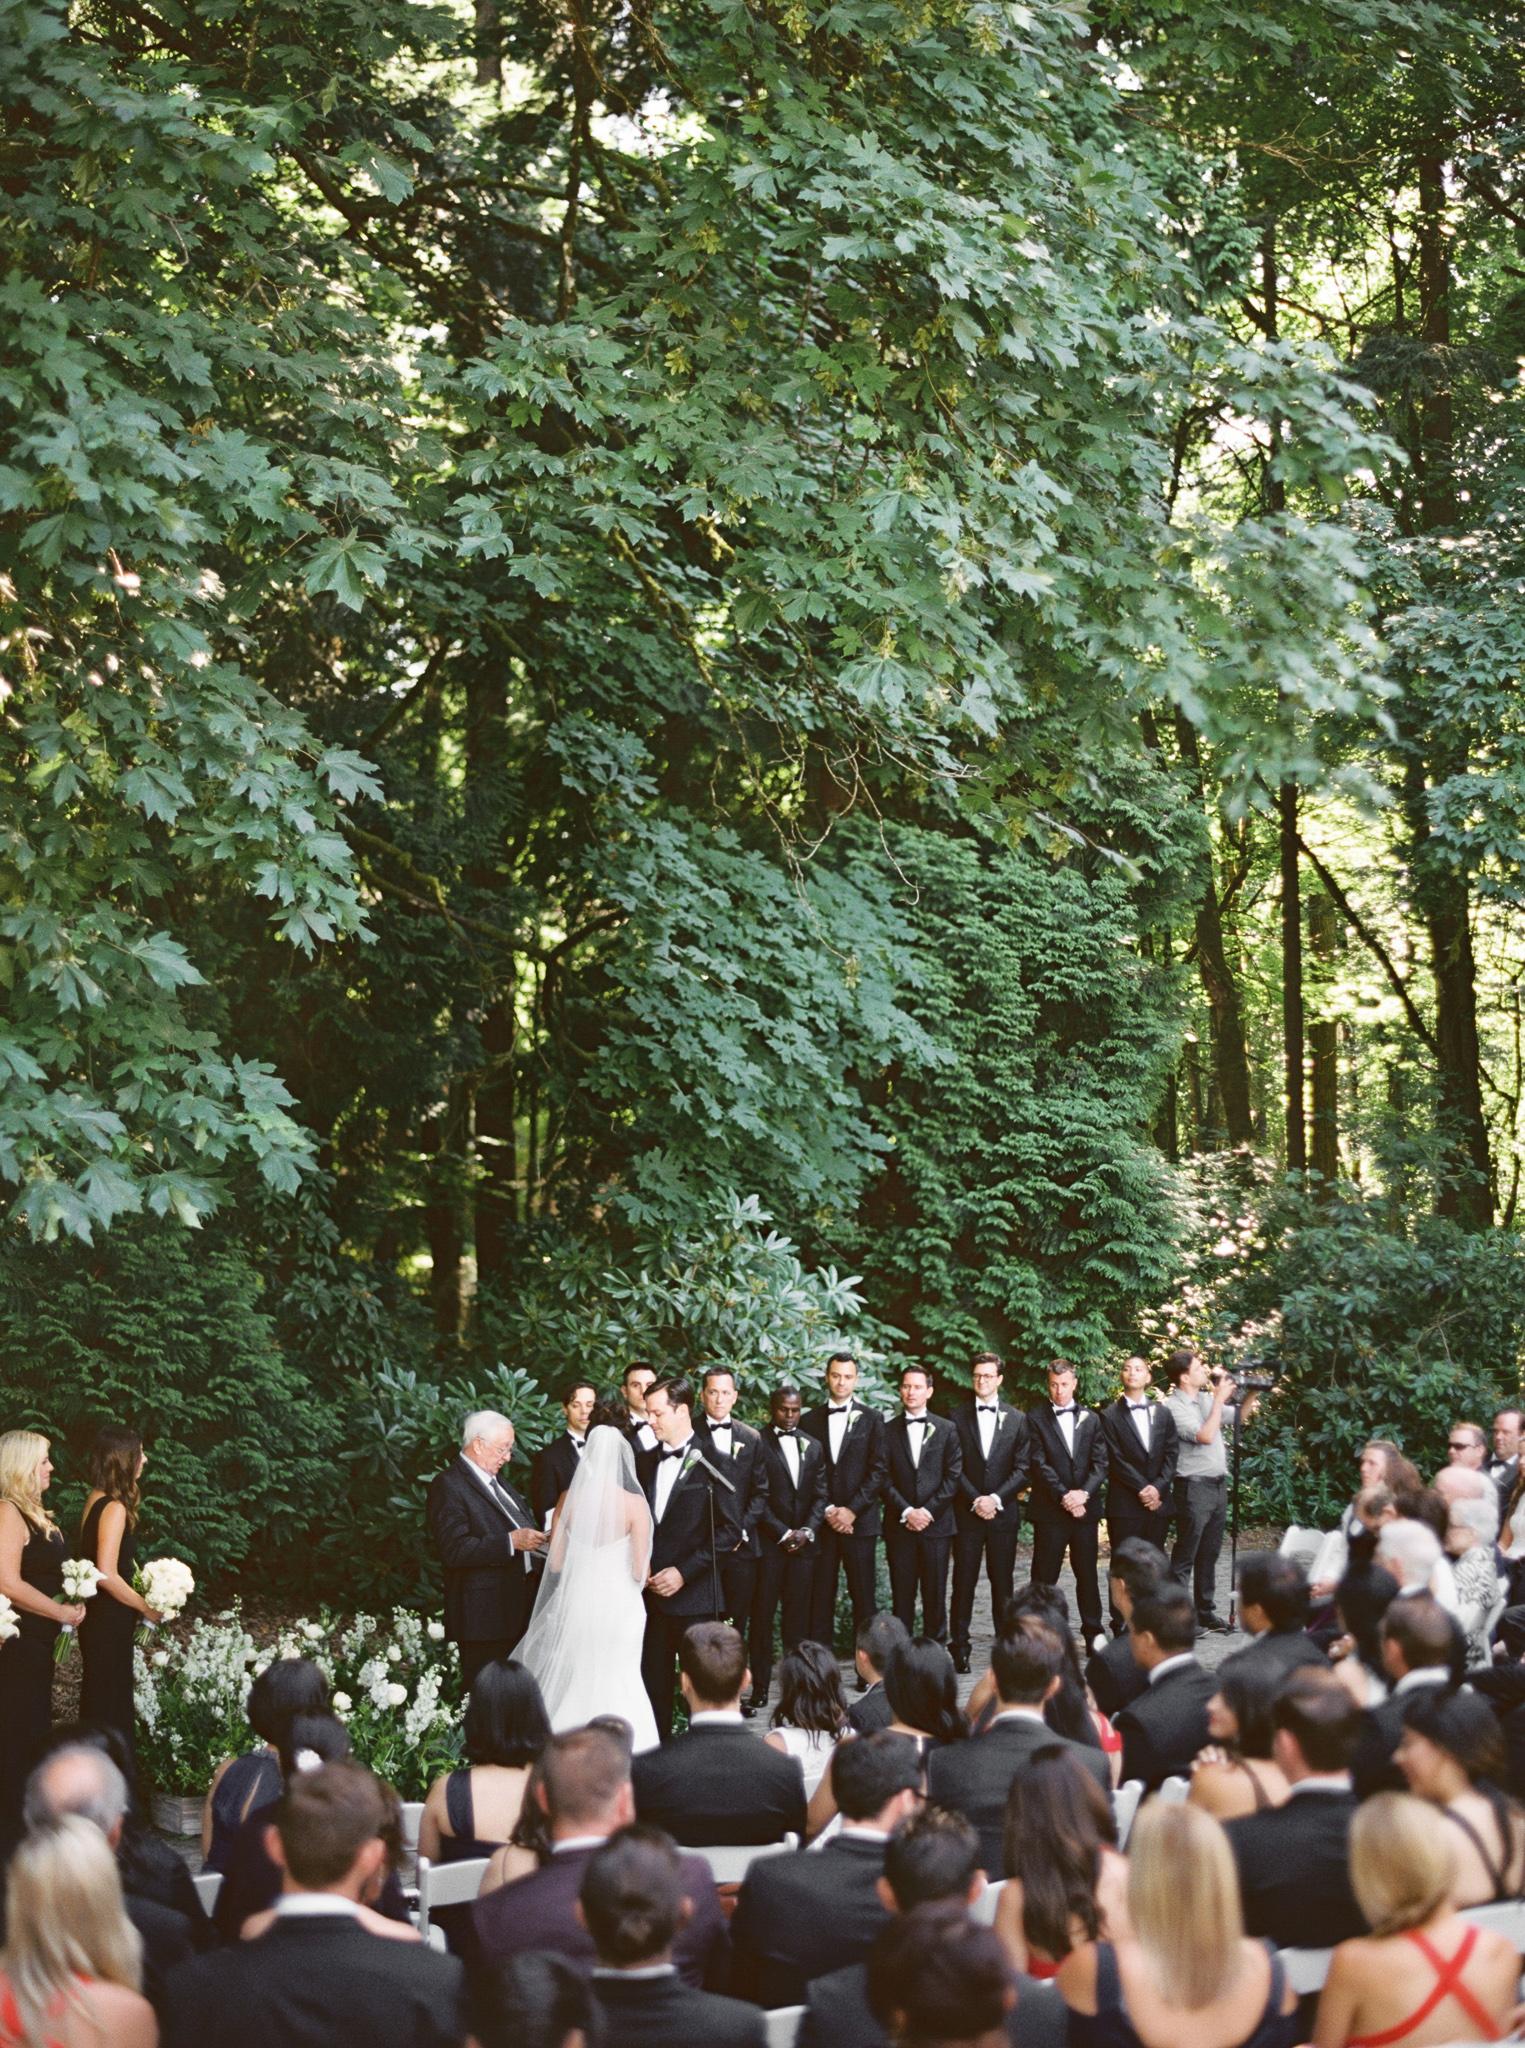 139OutliveCreative_Travel_Photographer_Videographer_Lewis&Clark_Oregon_Elegant_BlackTie_Destination_Wedding.jpg